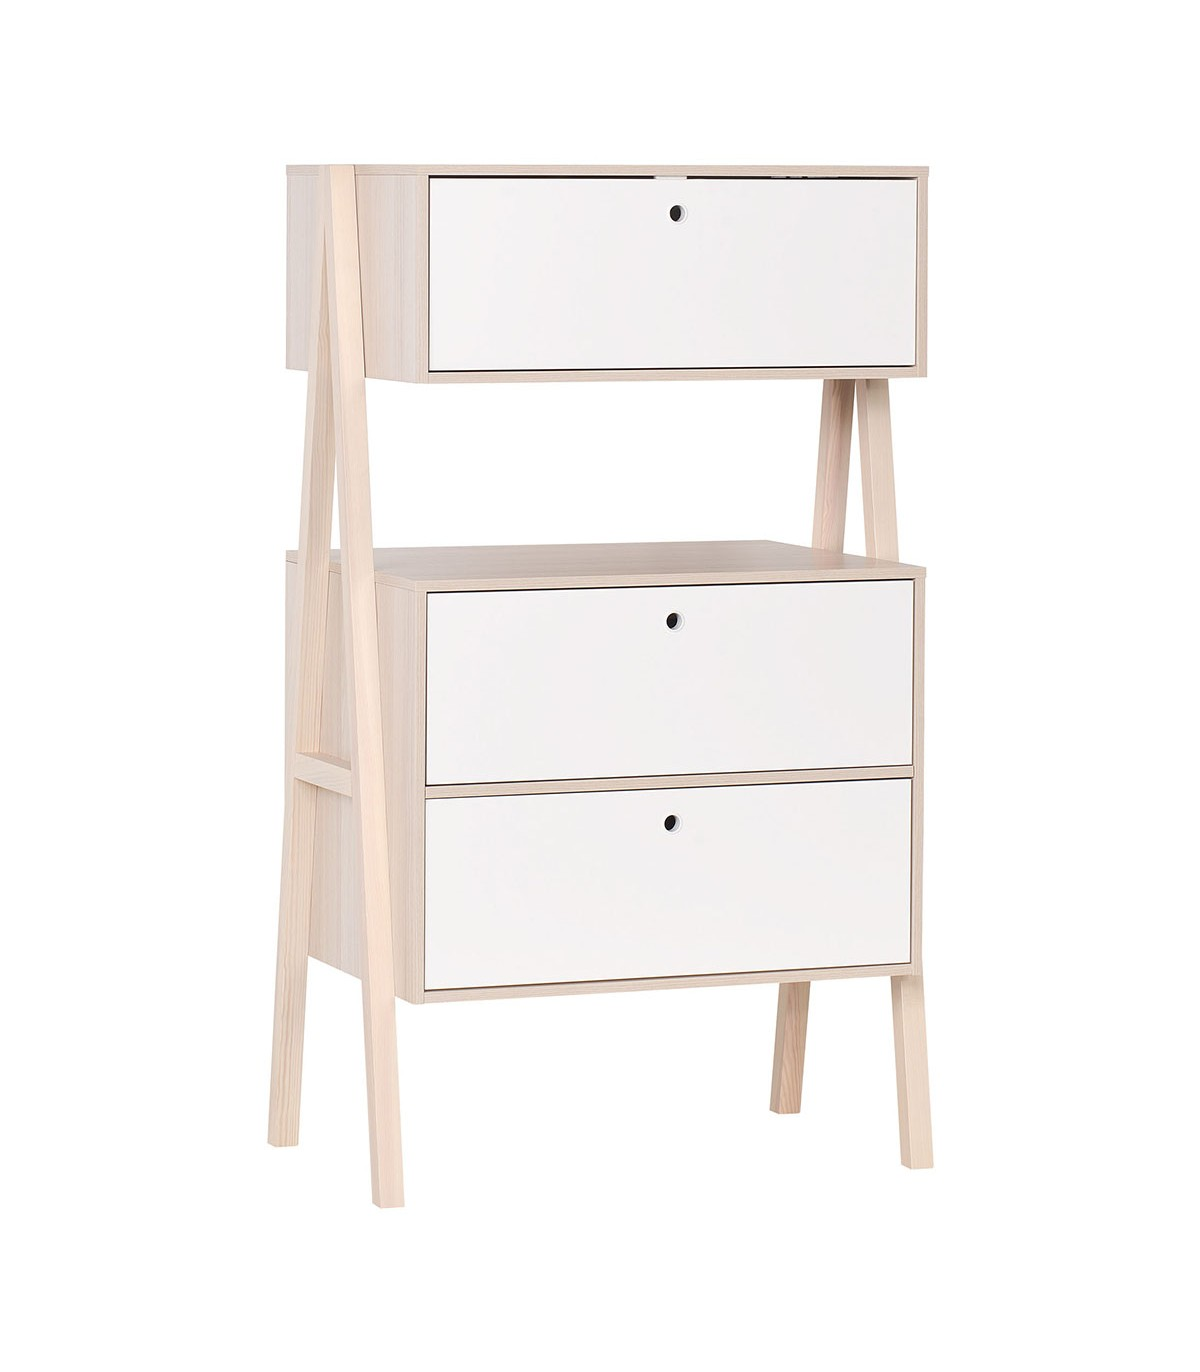 Commode 2 tiroirs et 1 porte abattant - Blanc et beige